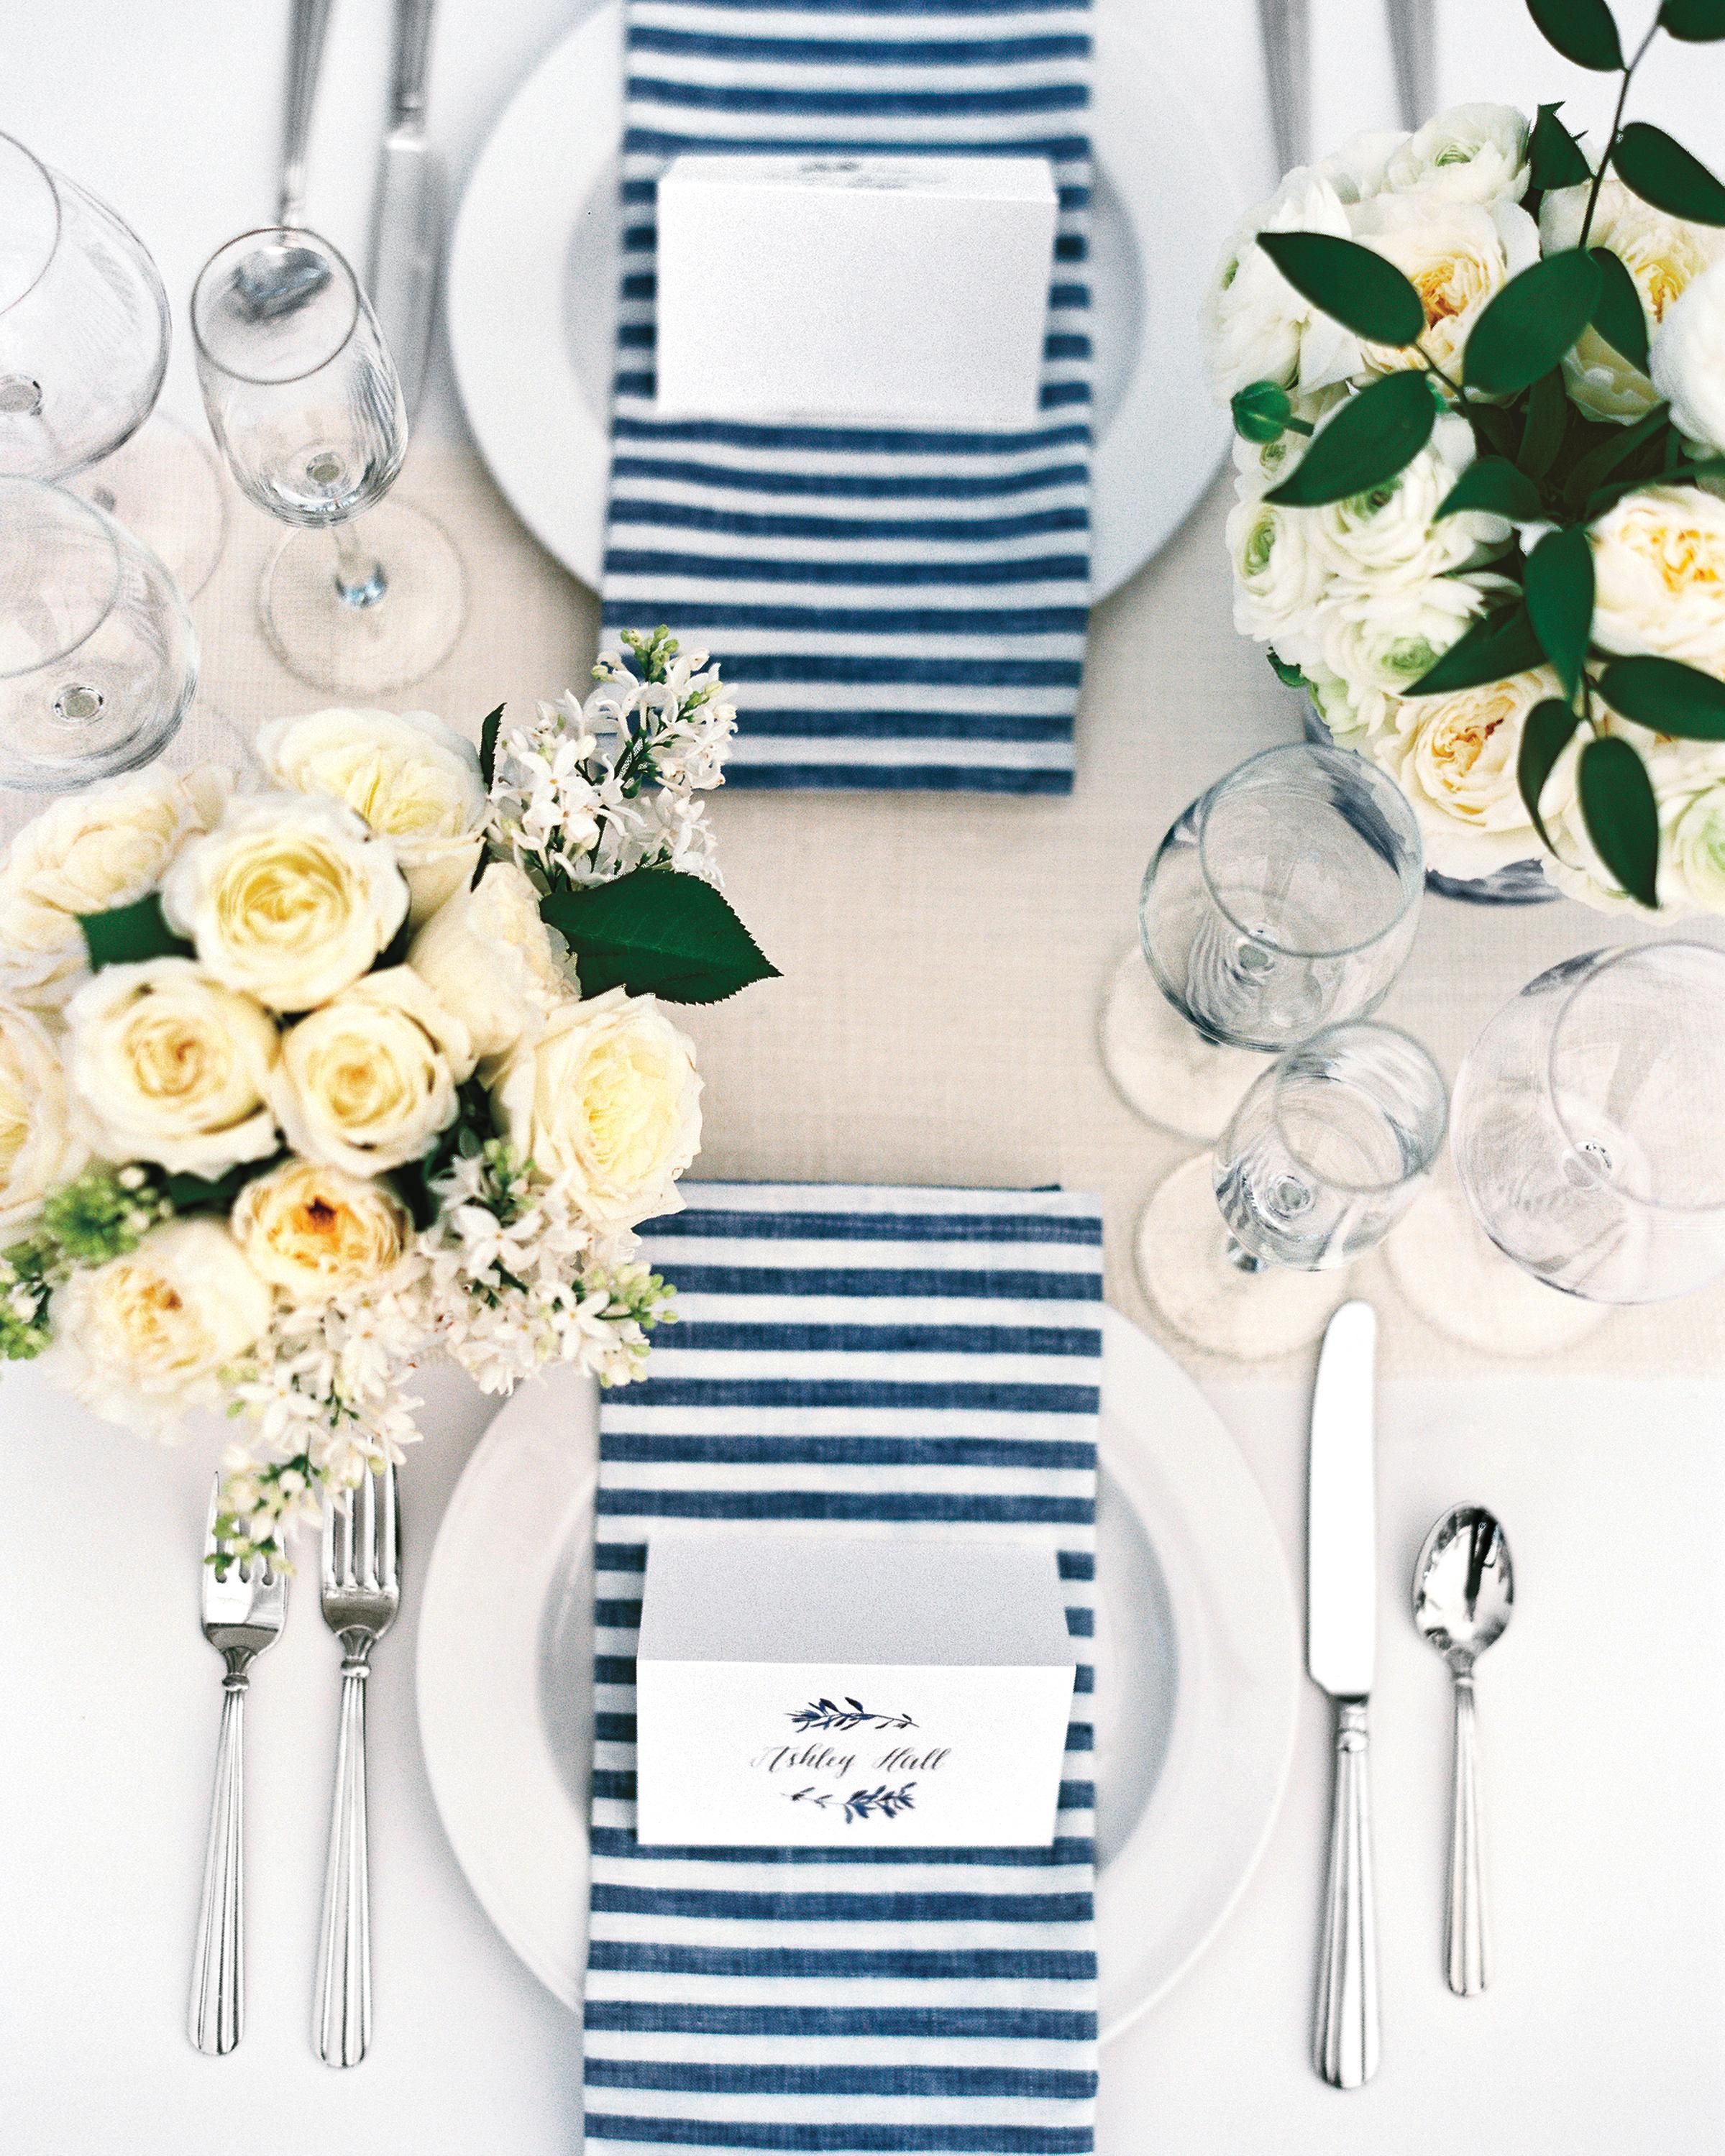 brooke-shea-wedding-002-d111277.jpg